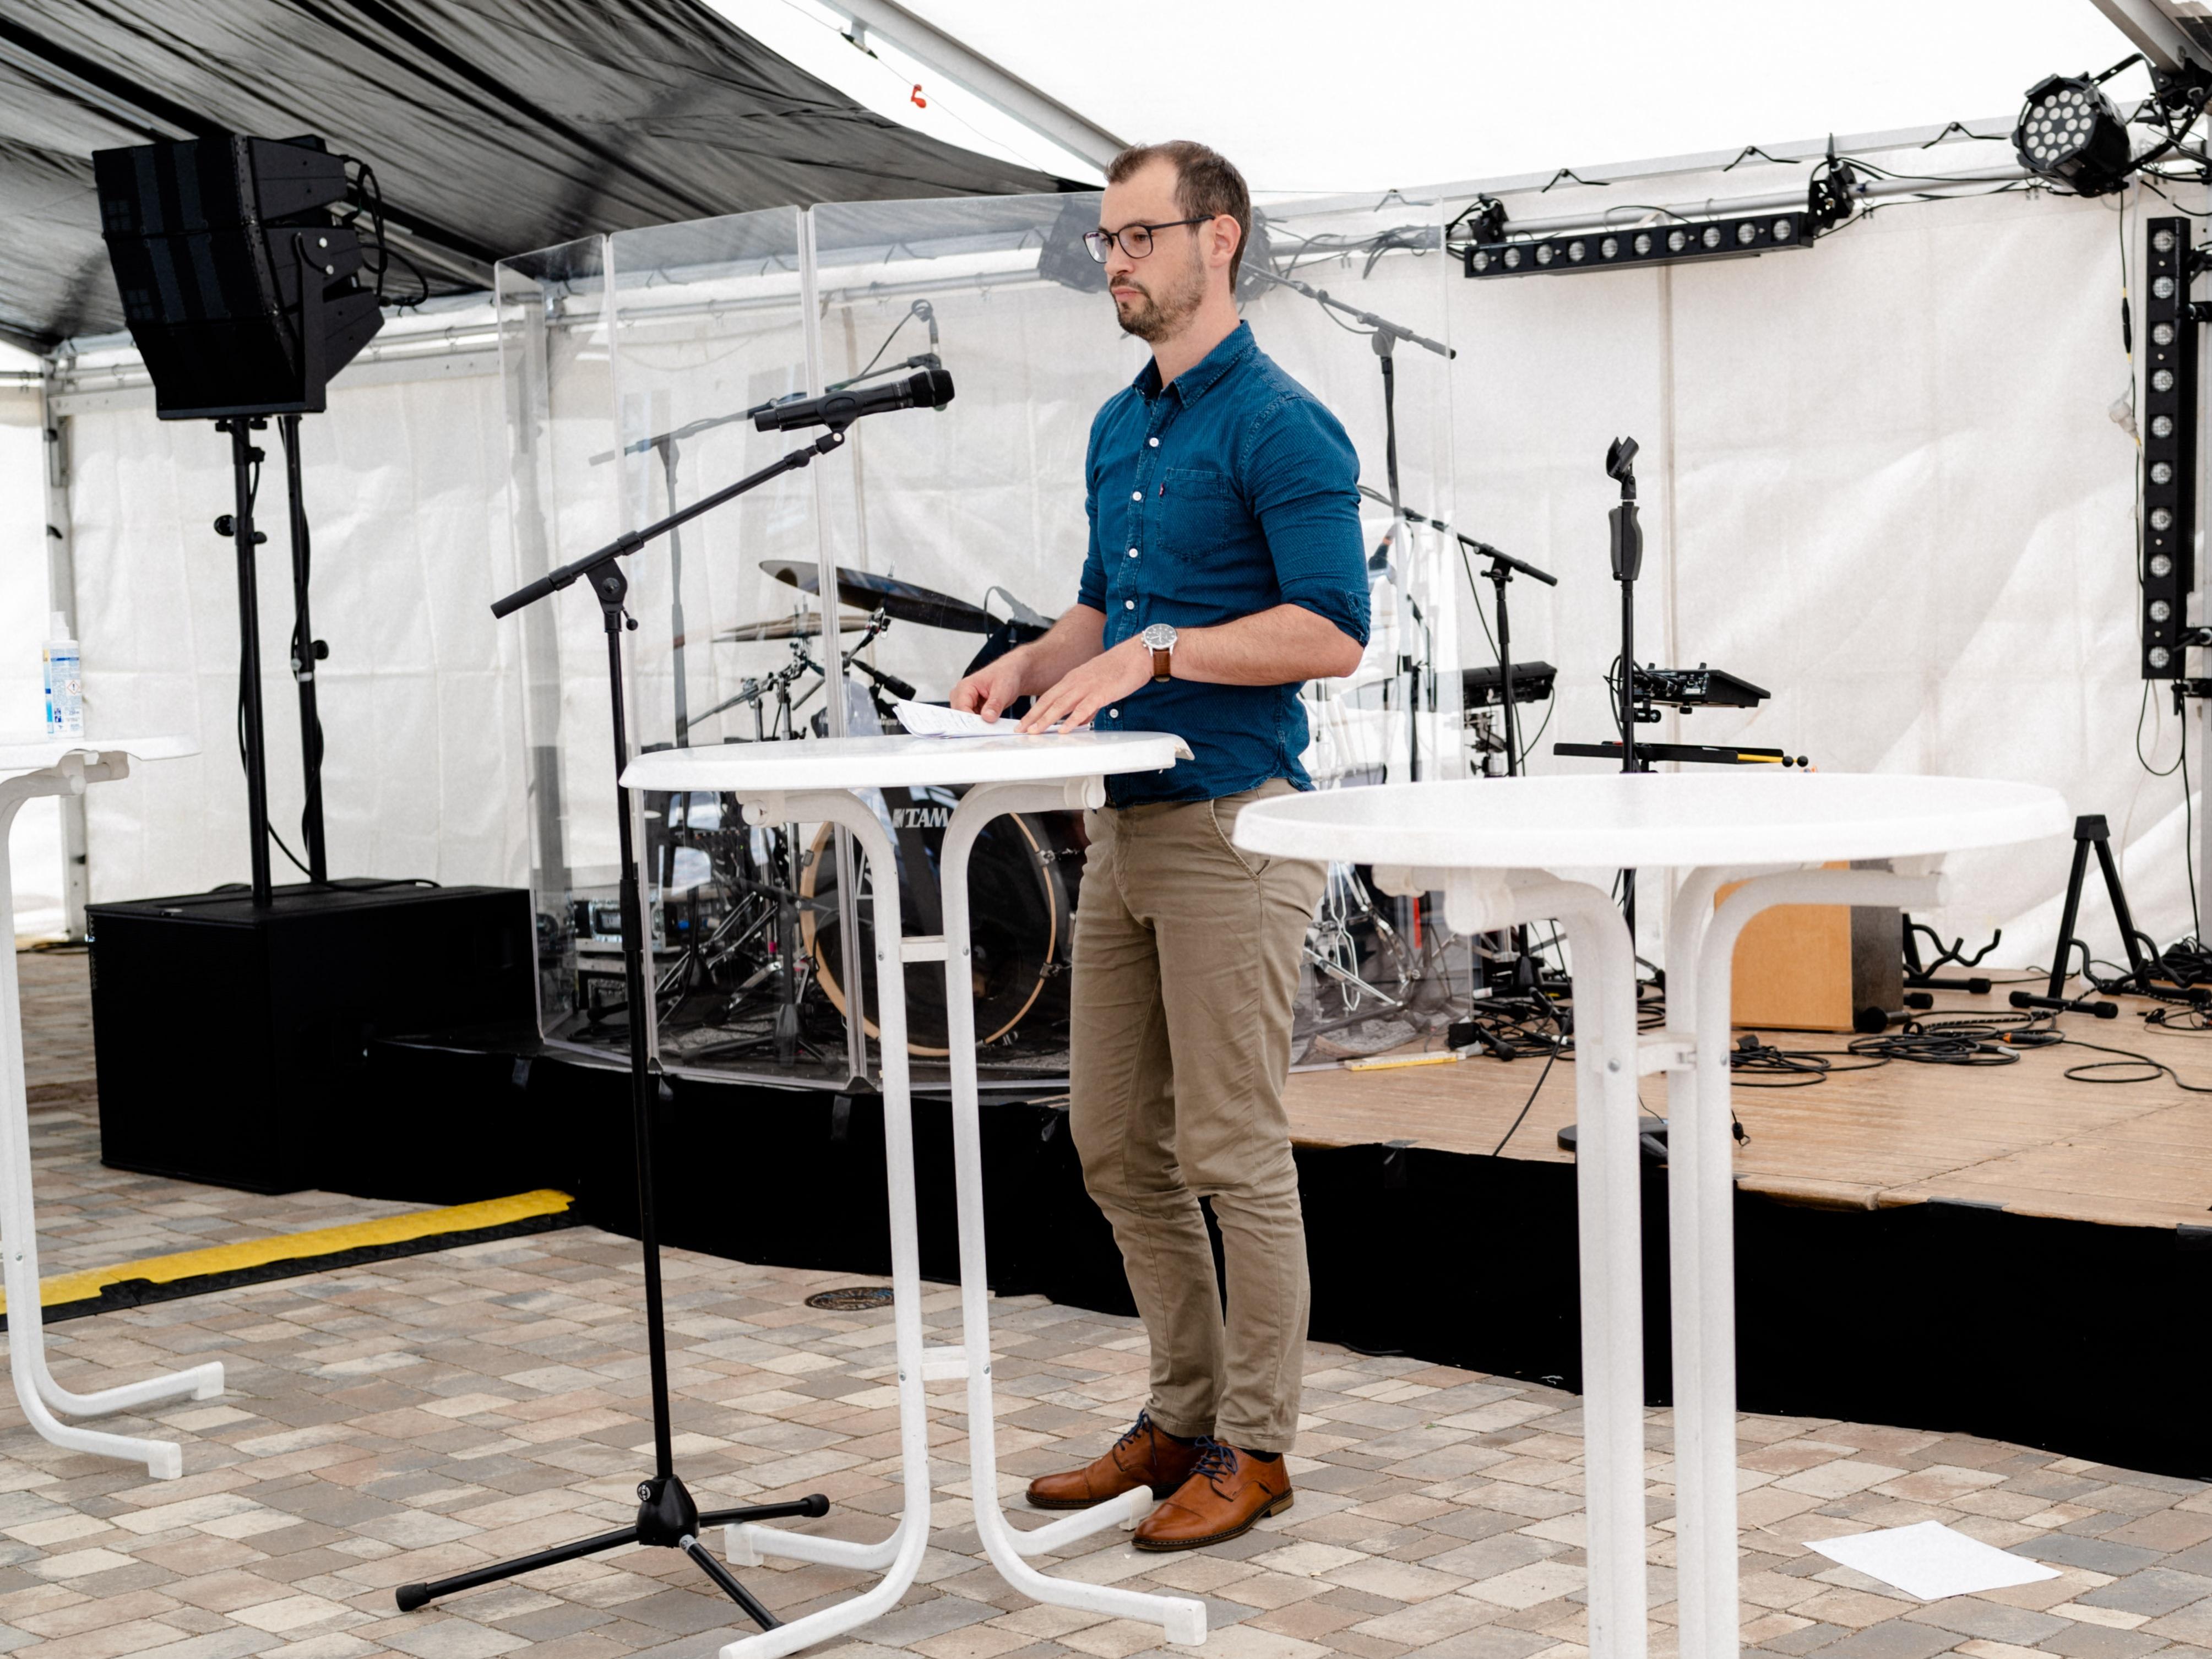 Schatzmeister Tobias Blatz